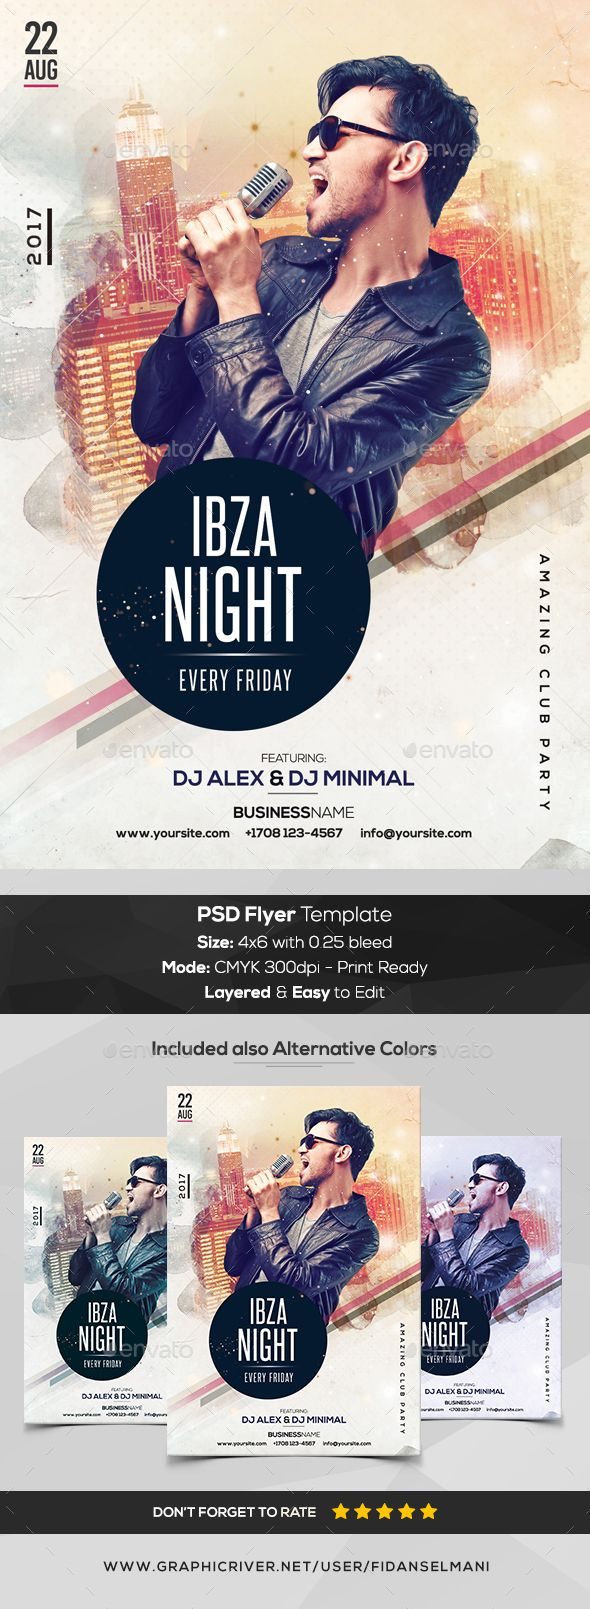 Ibza Night - PSD Flyer Template